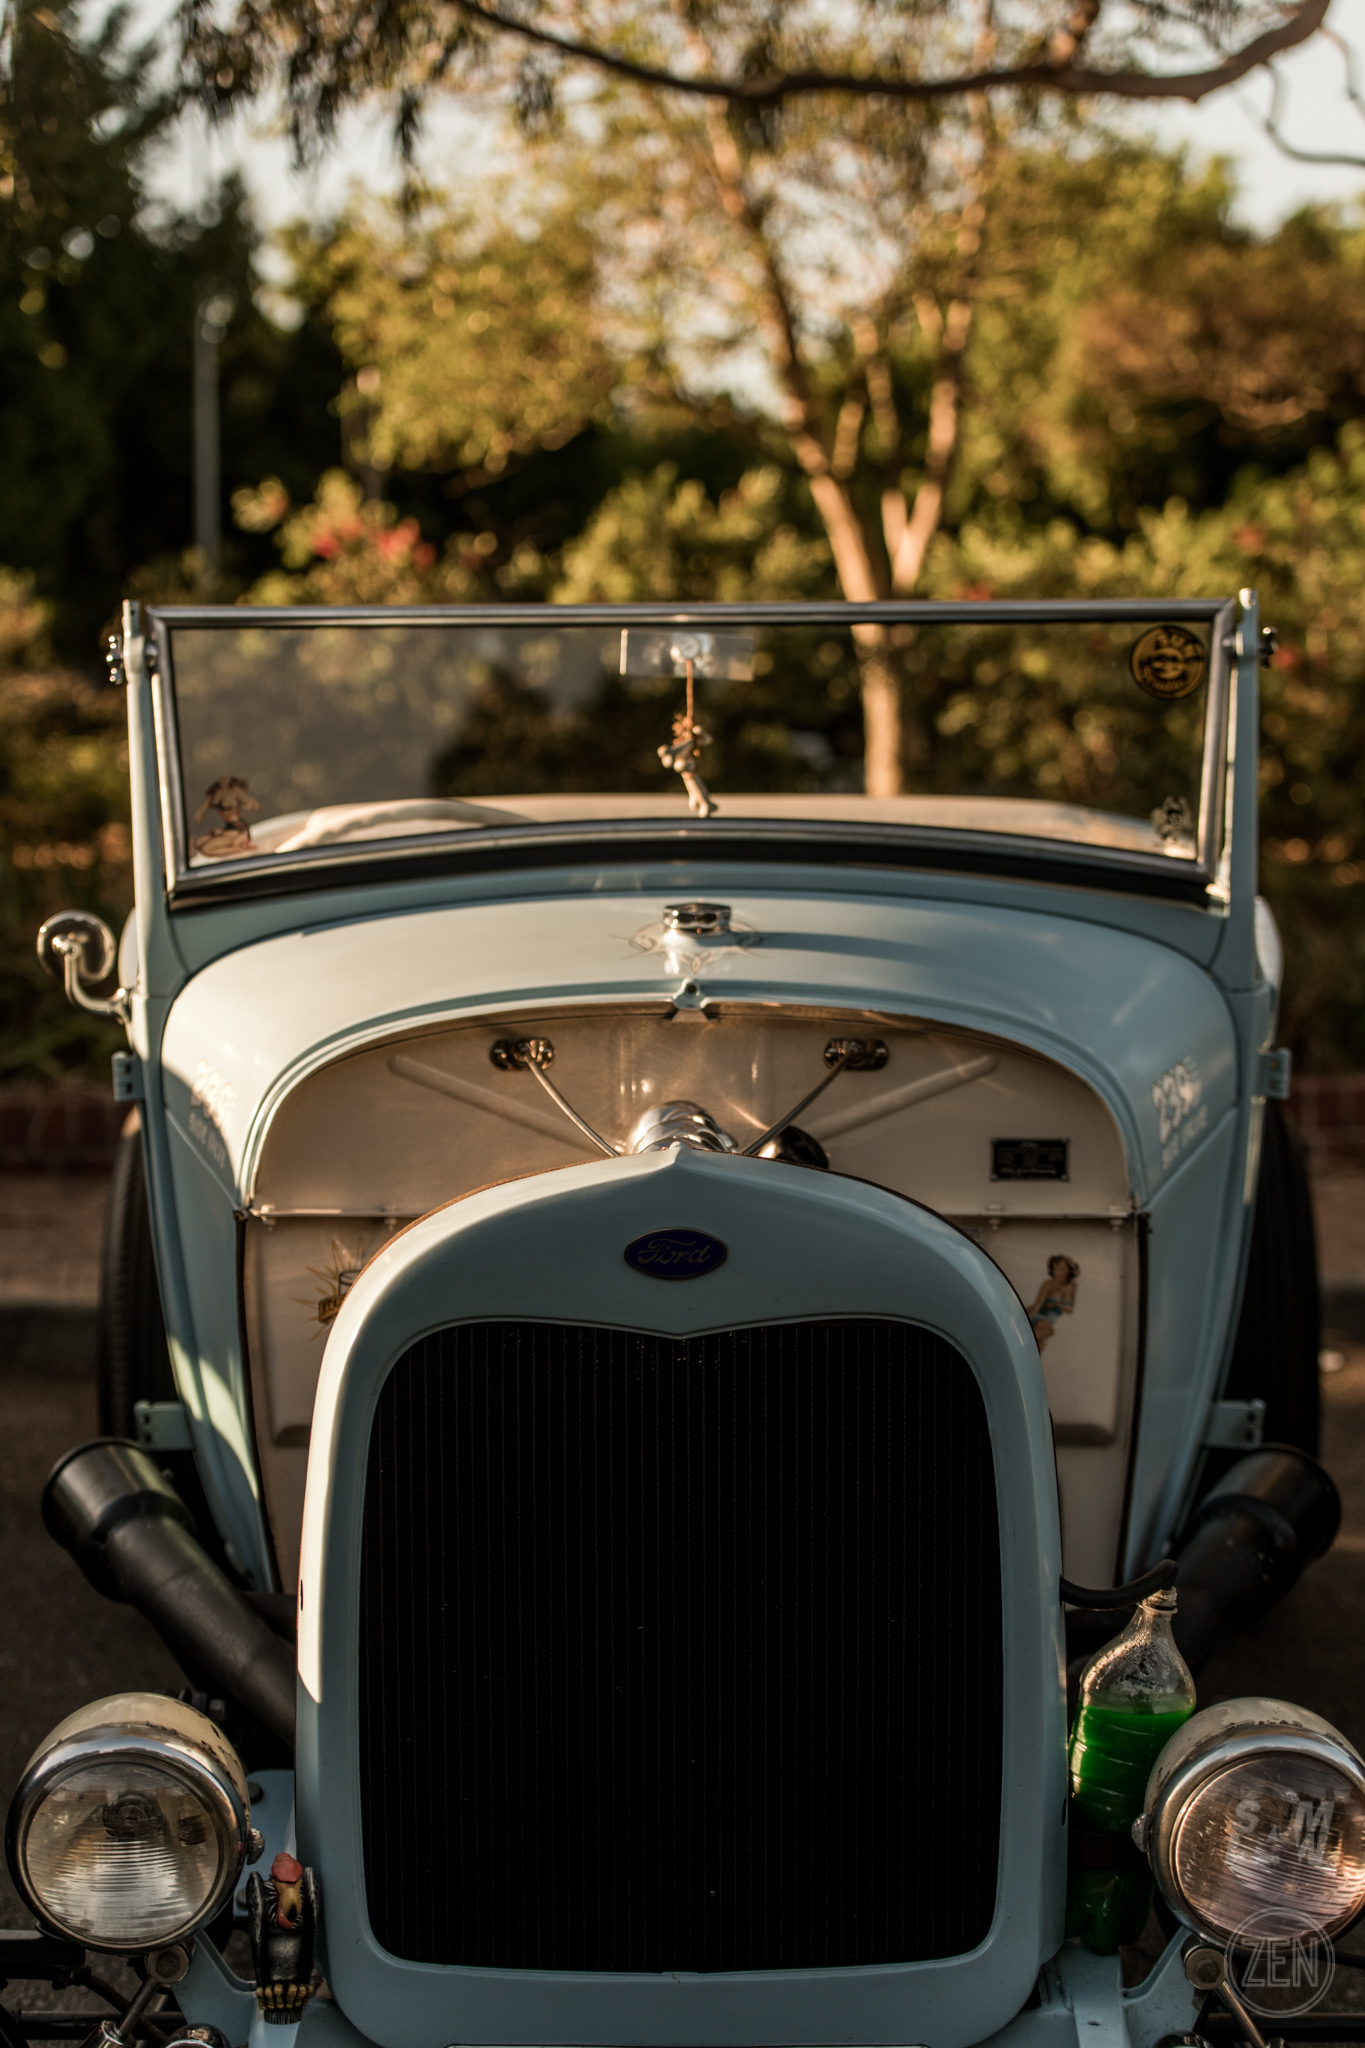 2019-10-27 - Autohaus Porsches & Coffee 050